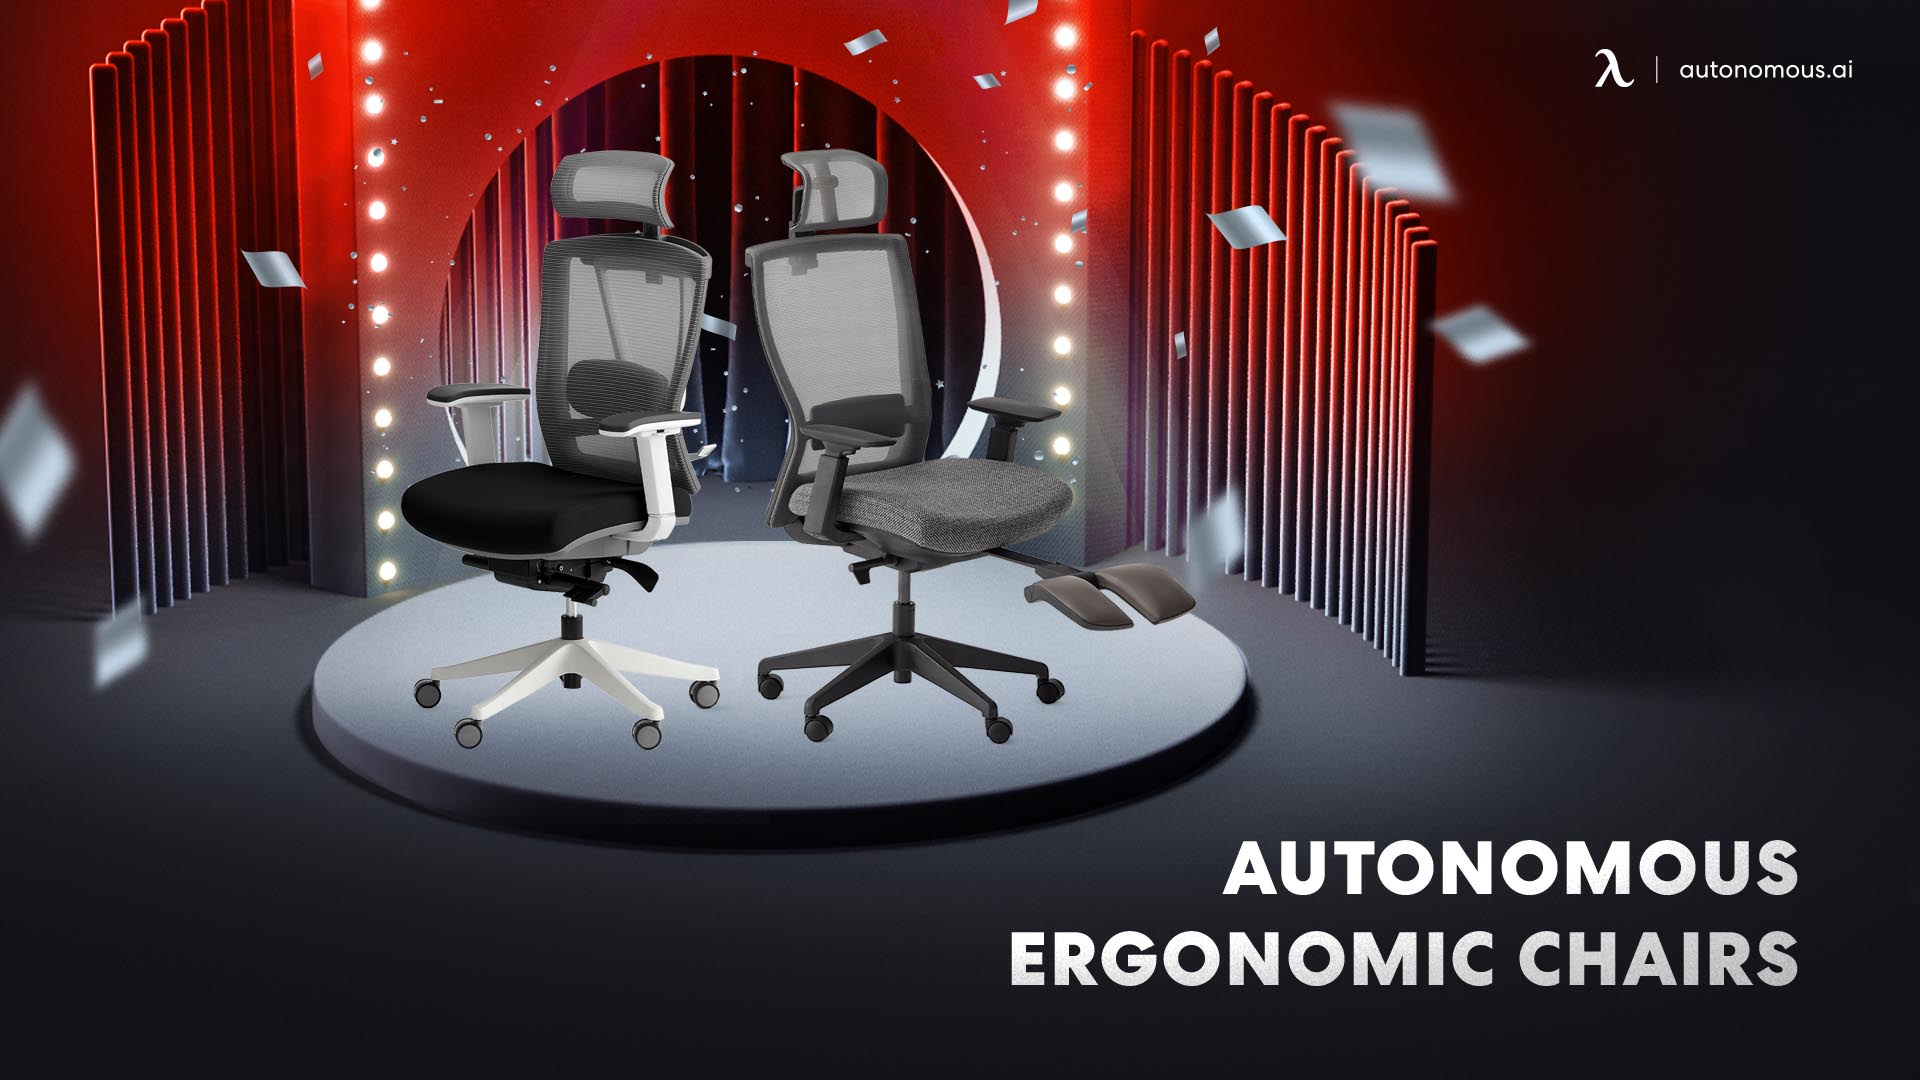 Autonomous Ergonomic Chairs